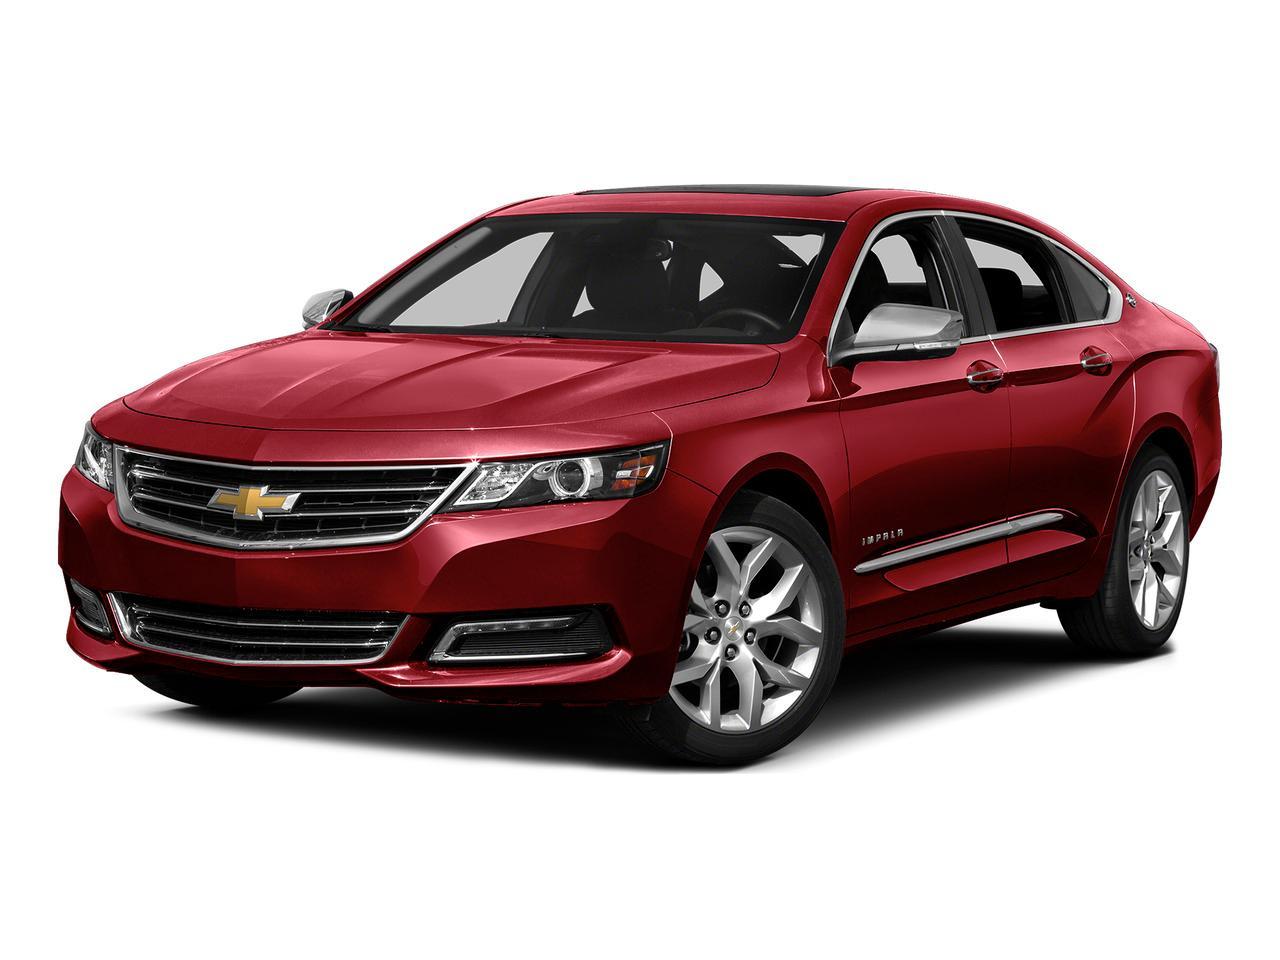 2016 Chevrolet Impala Vehicle Photo in Twin Falls, ID 83301